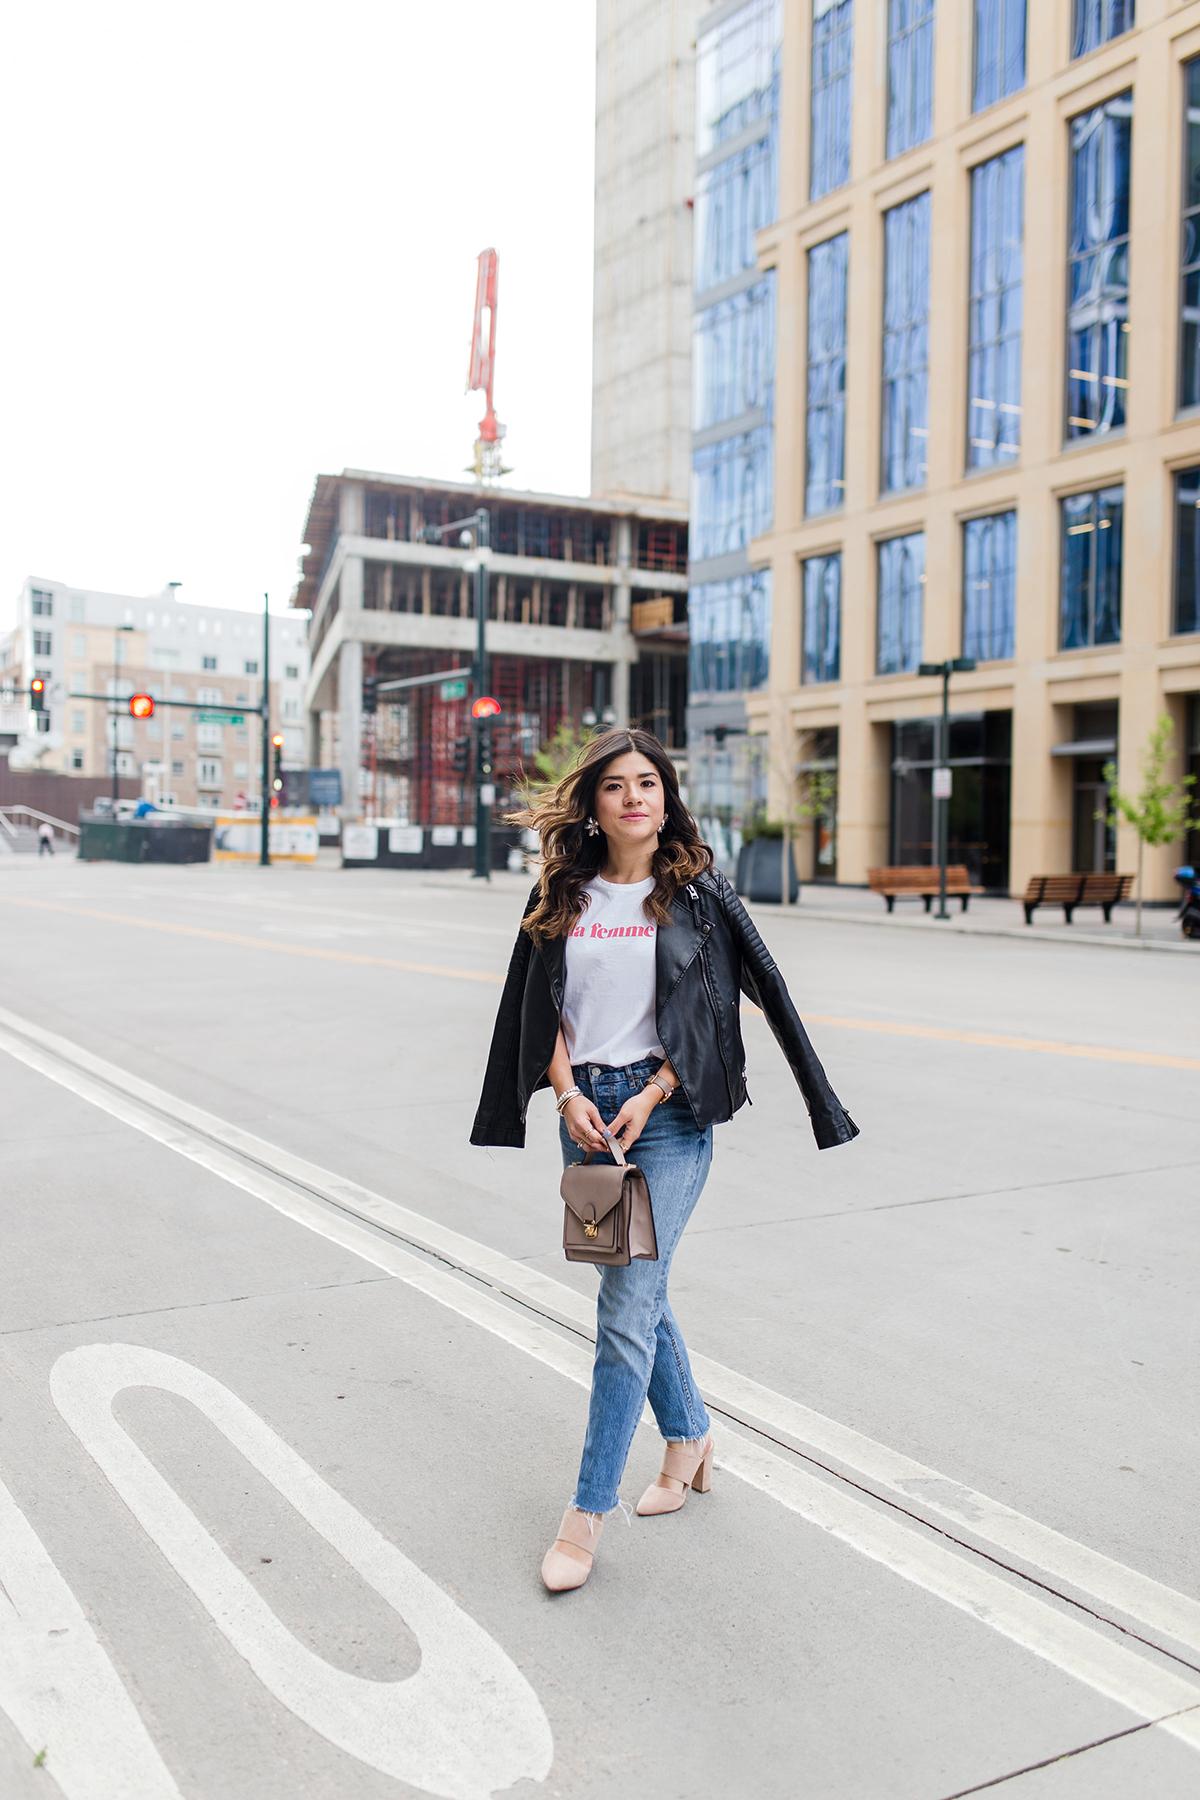 Carolina Hellal of Chic Talk wearing la femme t-shirt via Sezane, Levi's 501 straight vintage jeans, nude mules and topshop black faux leather jacket